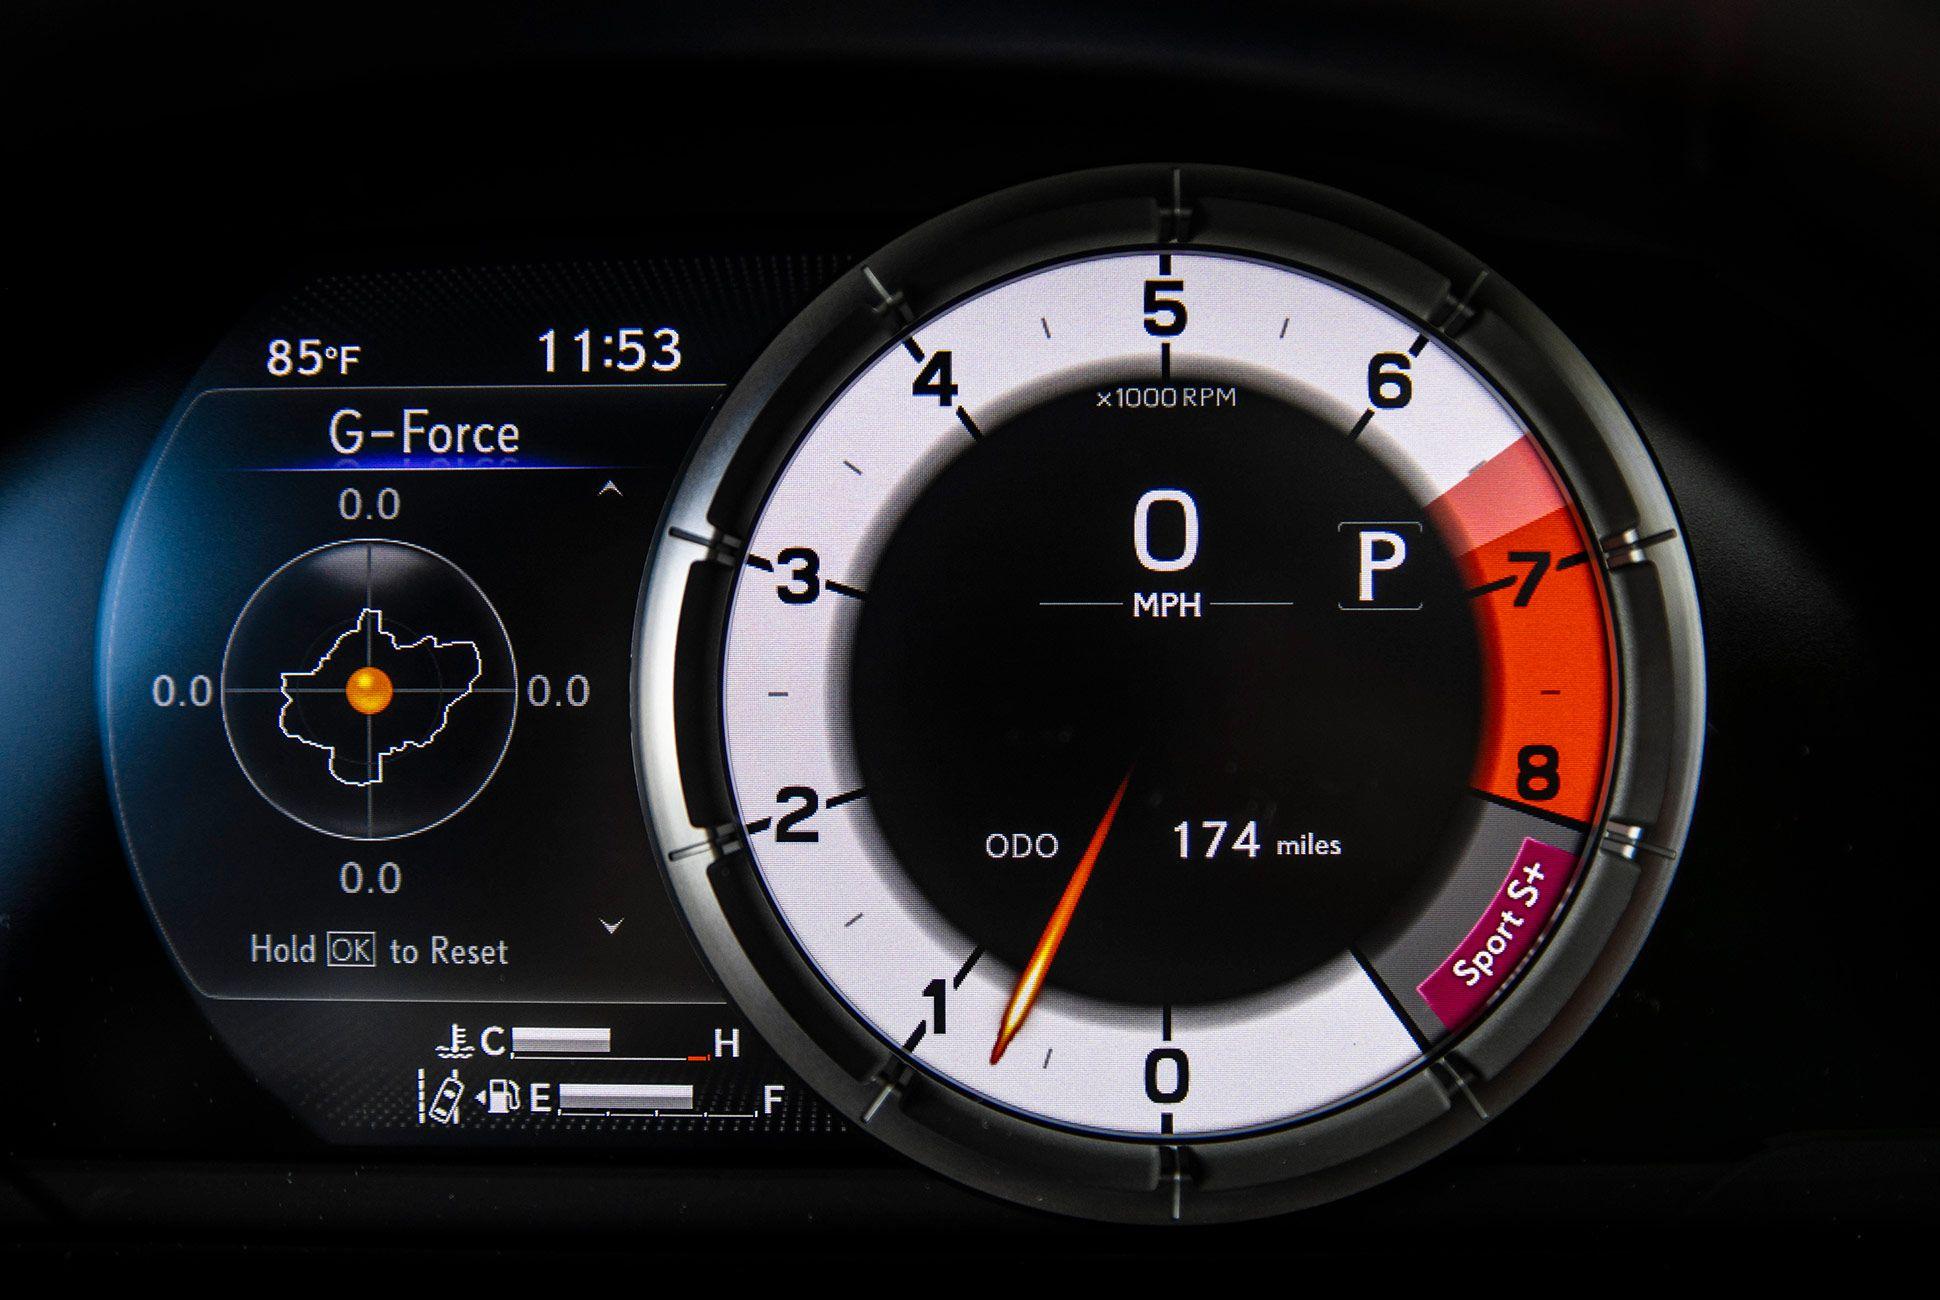 2019-Lexus-ES-350-F-Sport-Review-gear-patrol-slide-16